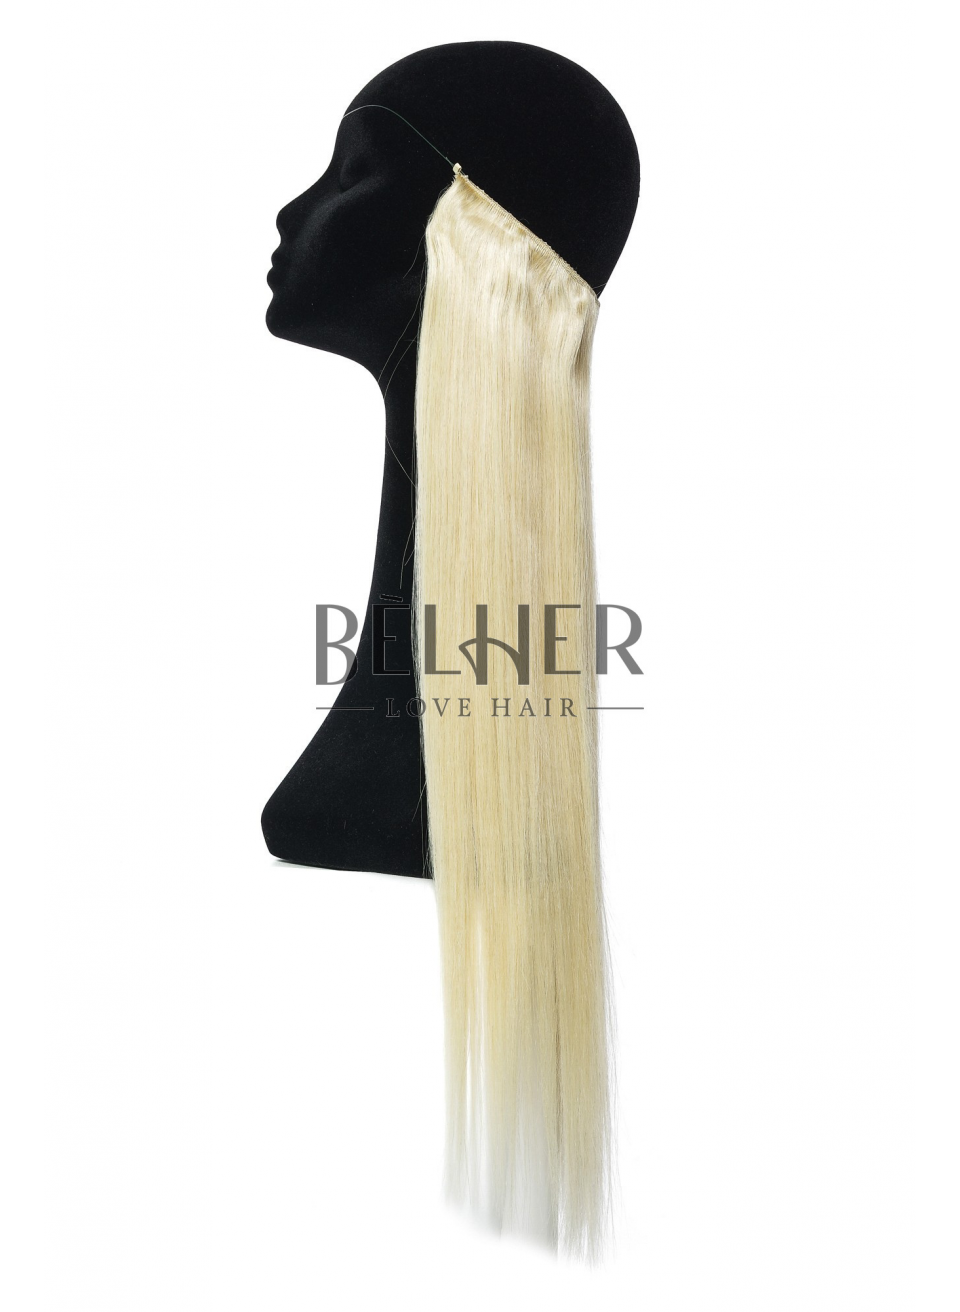 Blond Deschis Flip-In Premium